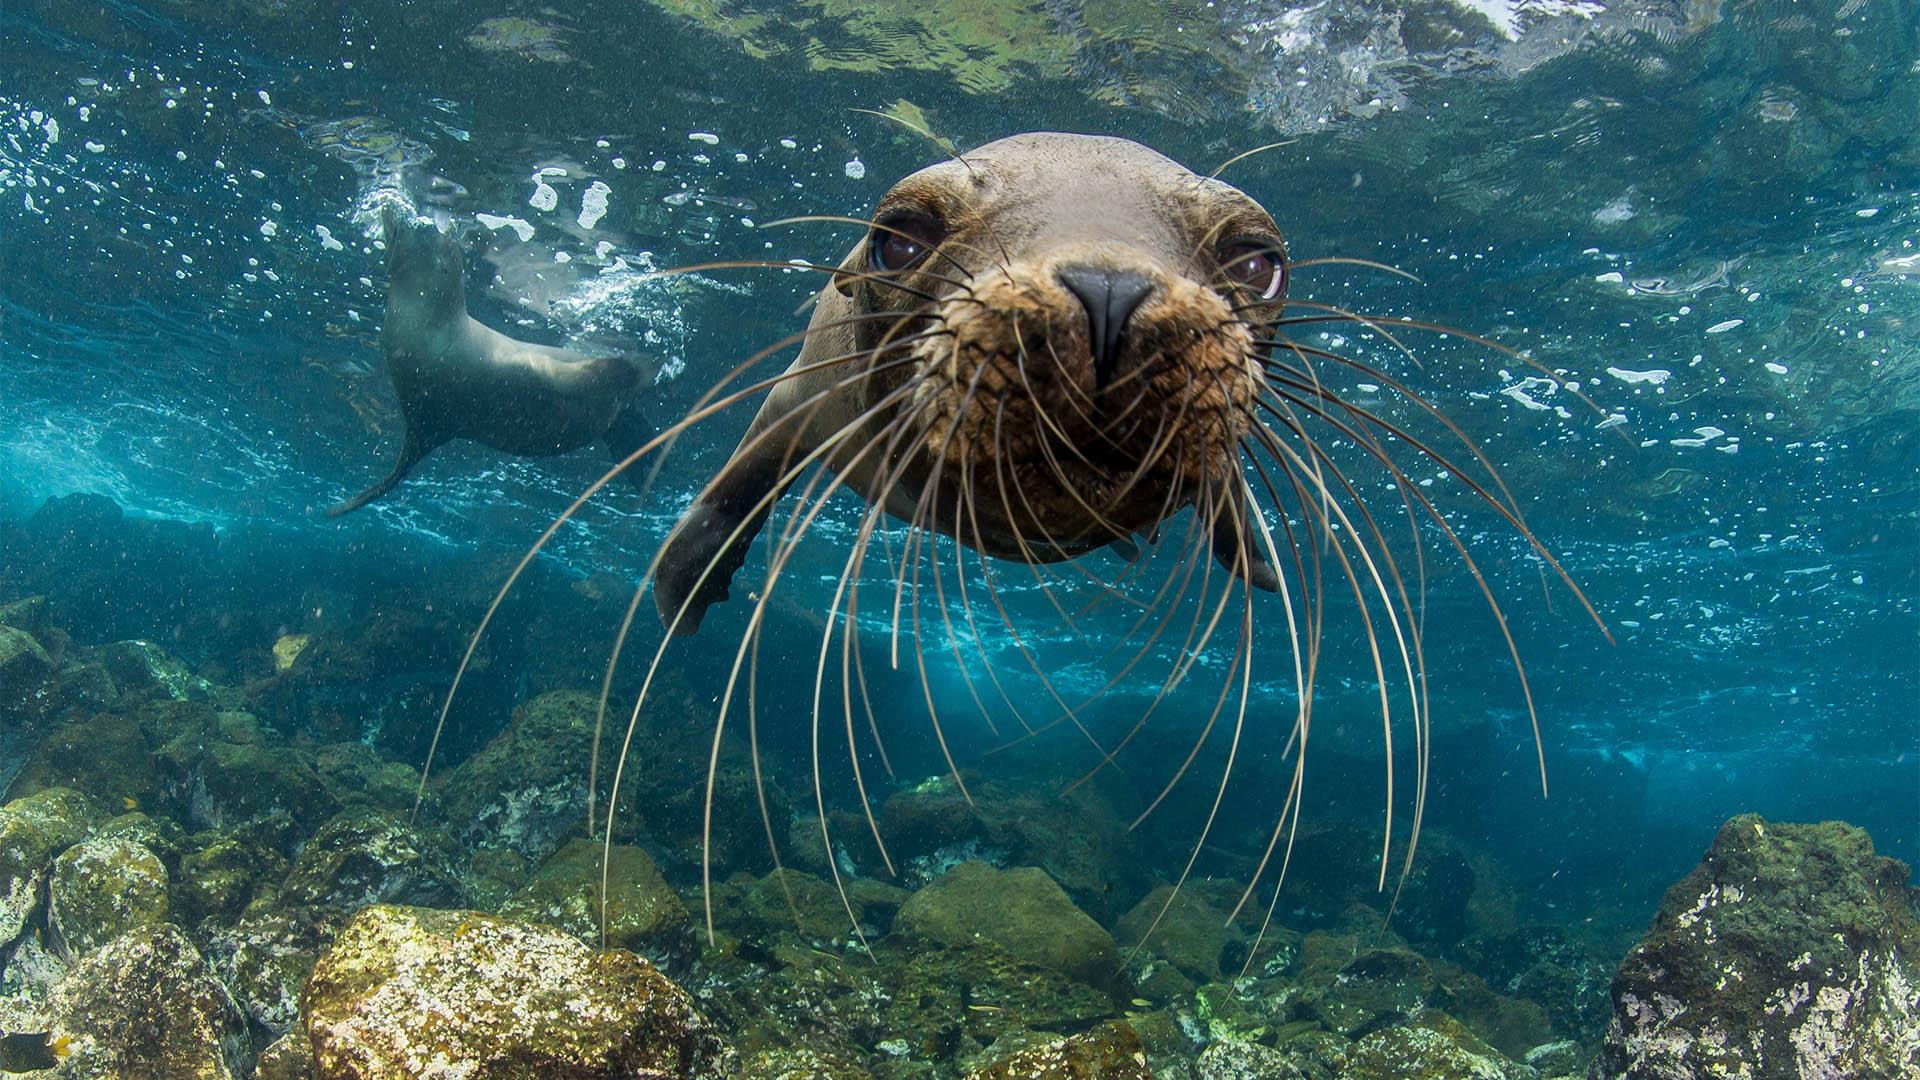 A young Galapagos sea lion approaches Enric Sala's camera curiousy off Santa Cruz Island. (Photo credit: Enric Sala)